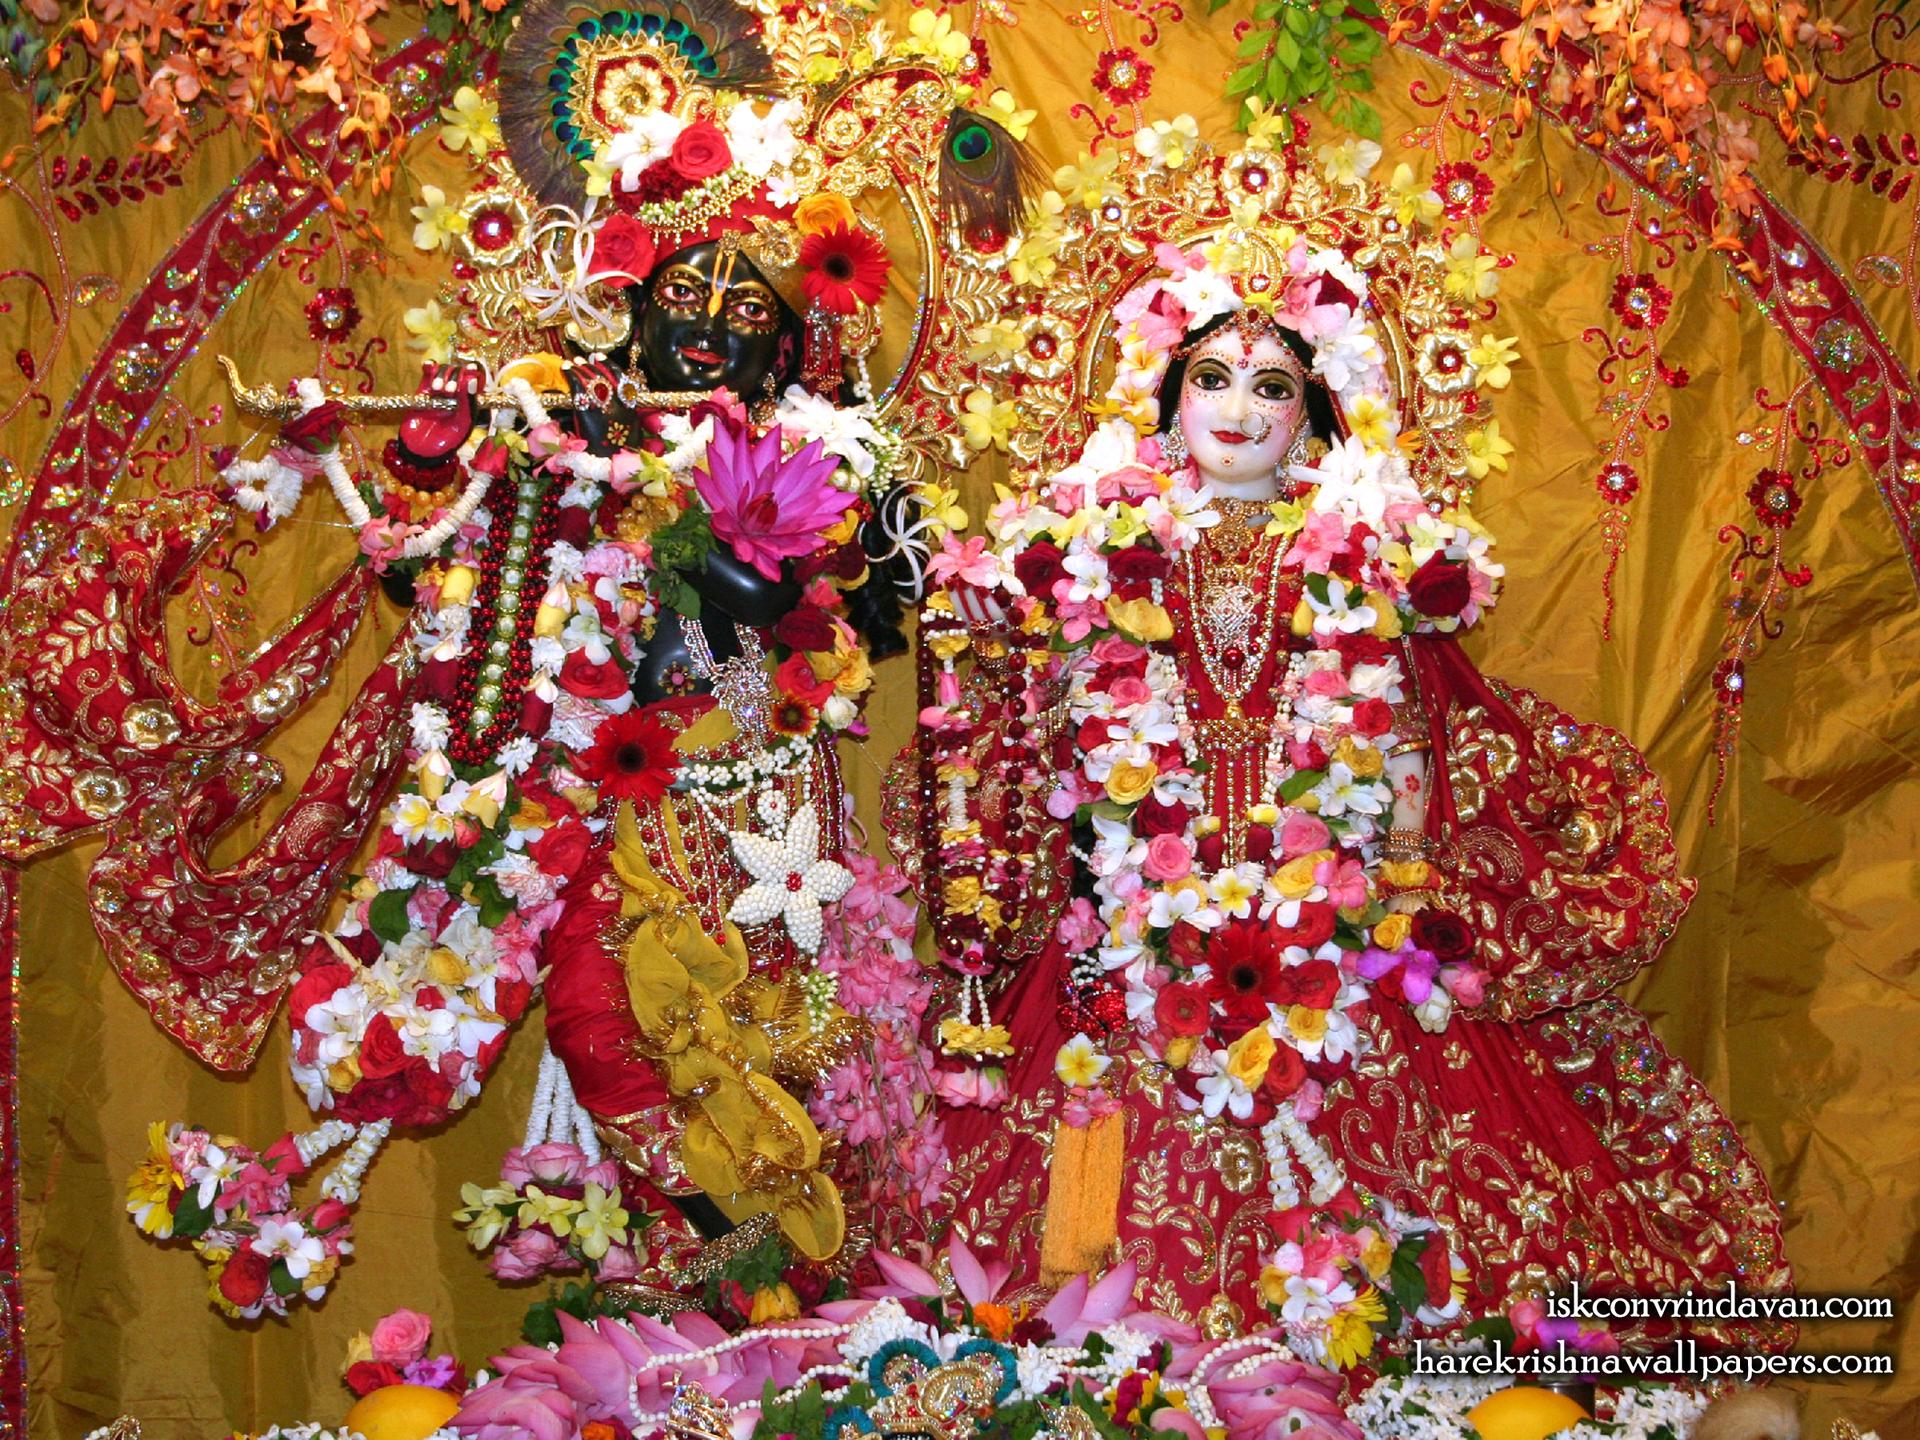 Sri Sri Radha Shyamsundar Wallpaper (004) Size 1920x1440 Download